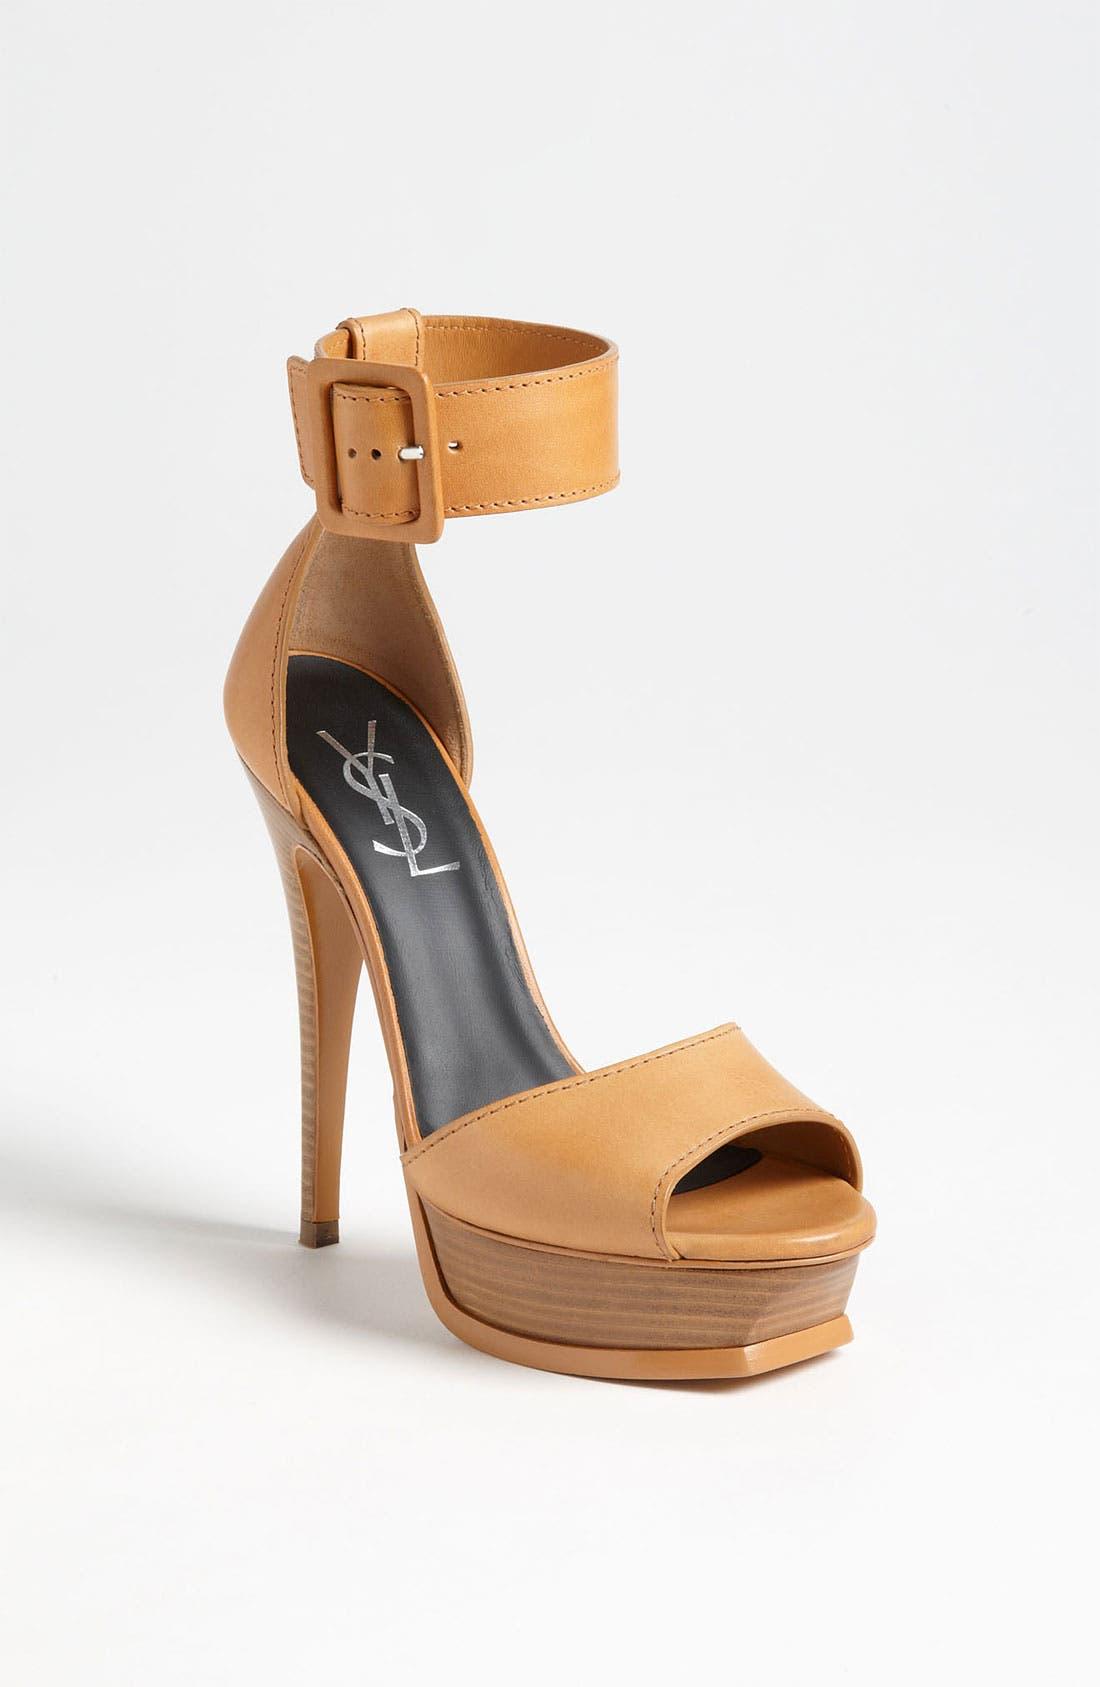 Main Image - Saint Laurent 'Tribute' Sandal